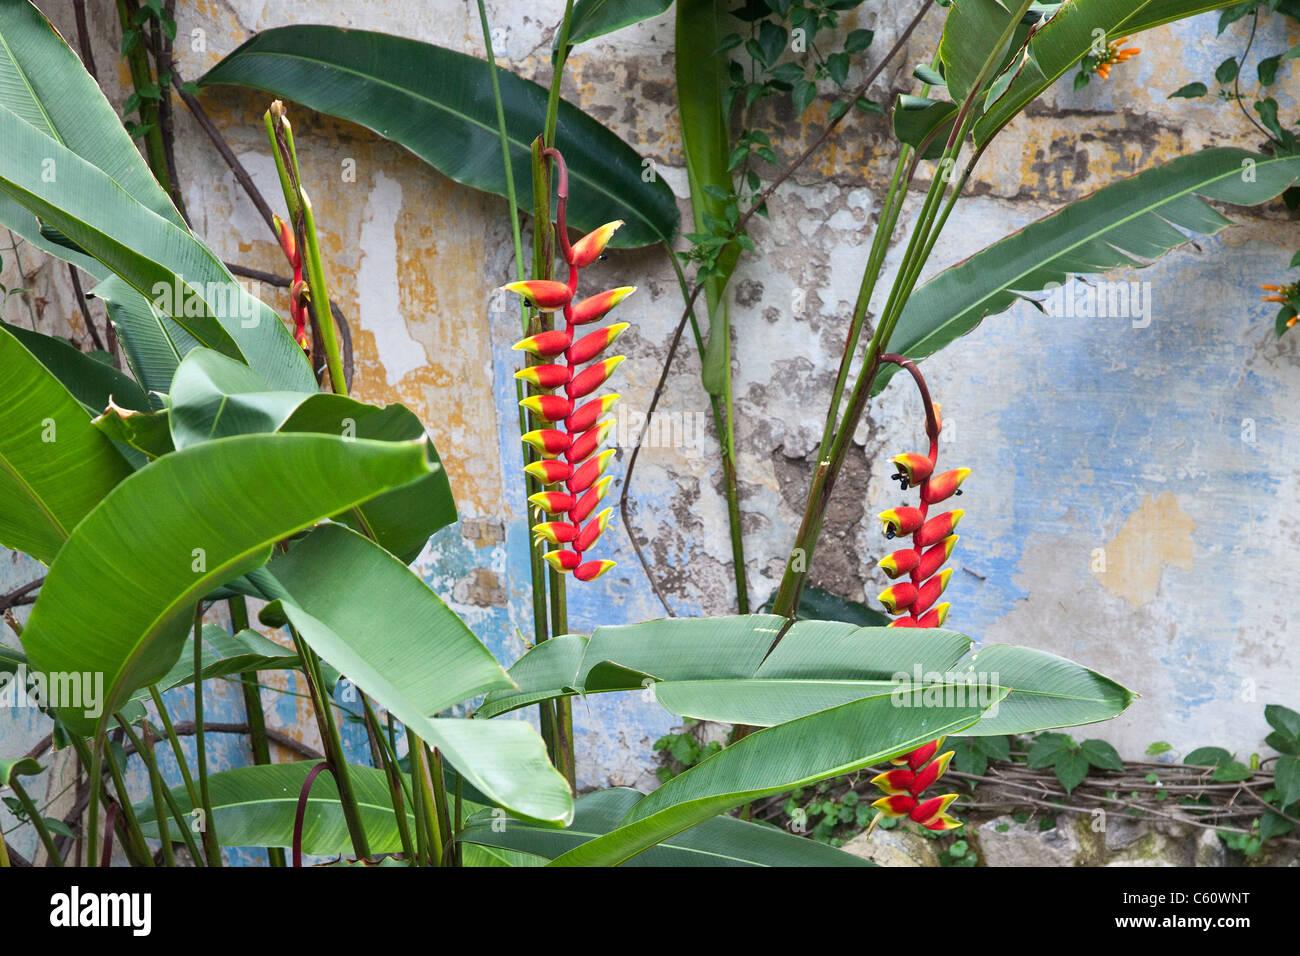 Heliconia pendula, Antigua, Guatemala - Stock Image